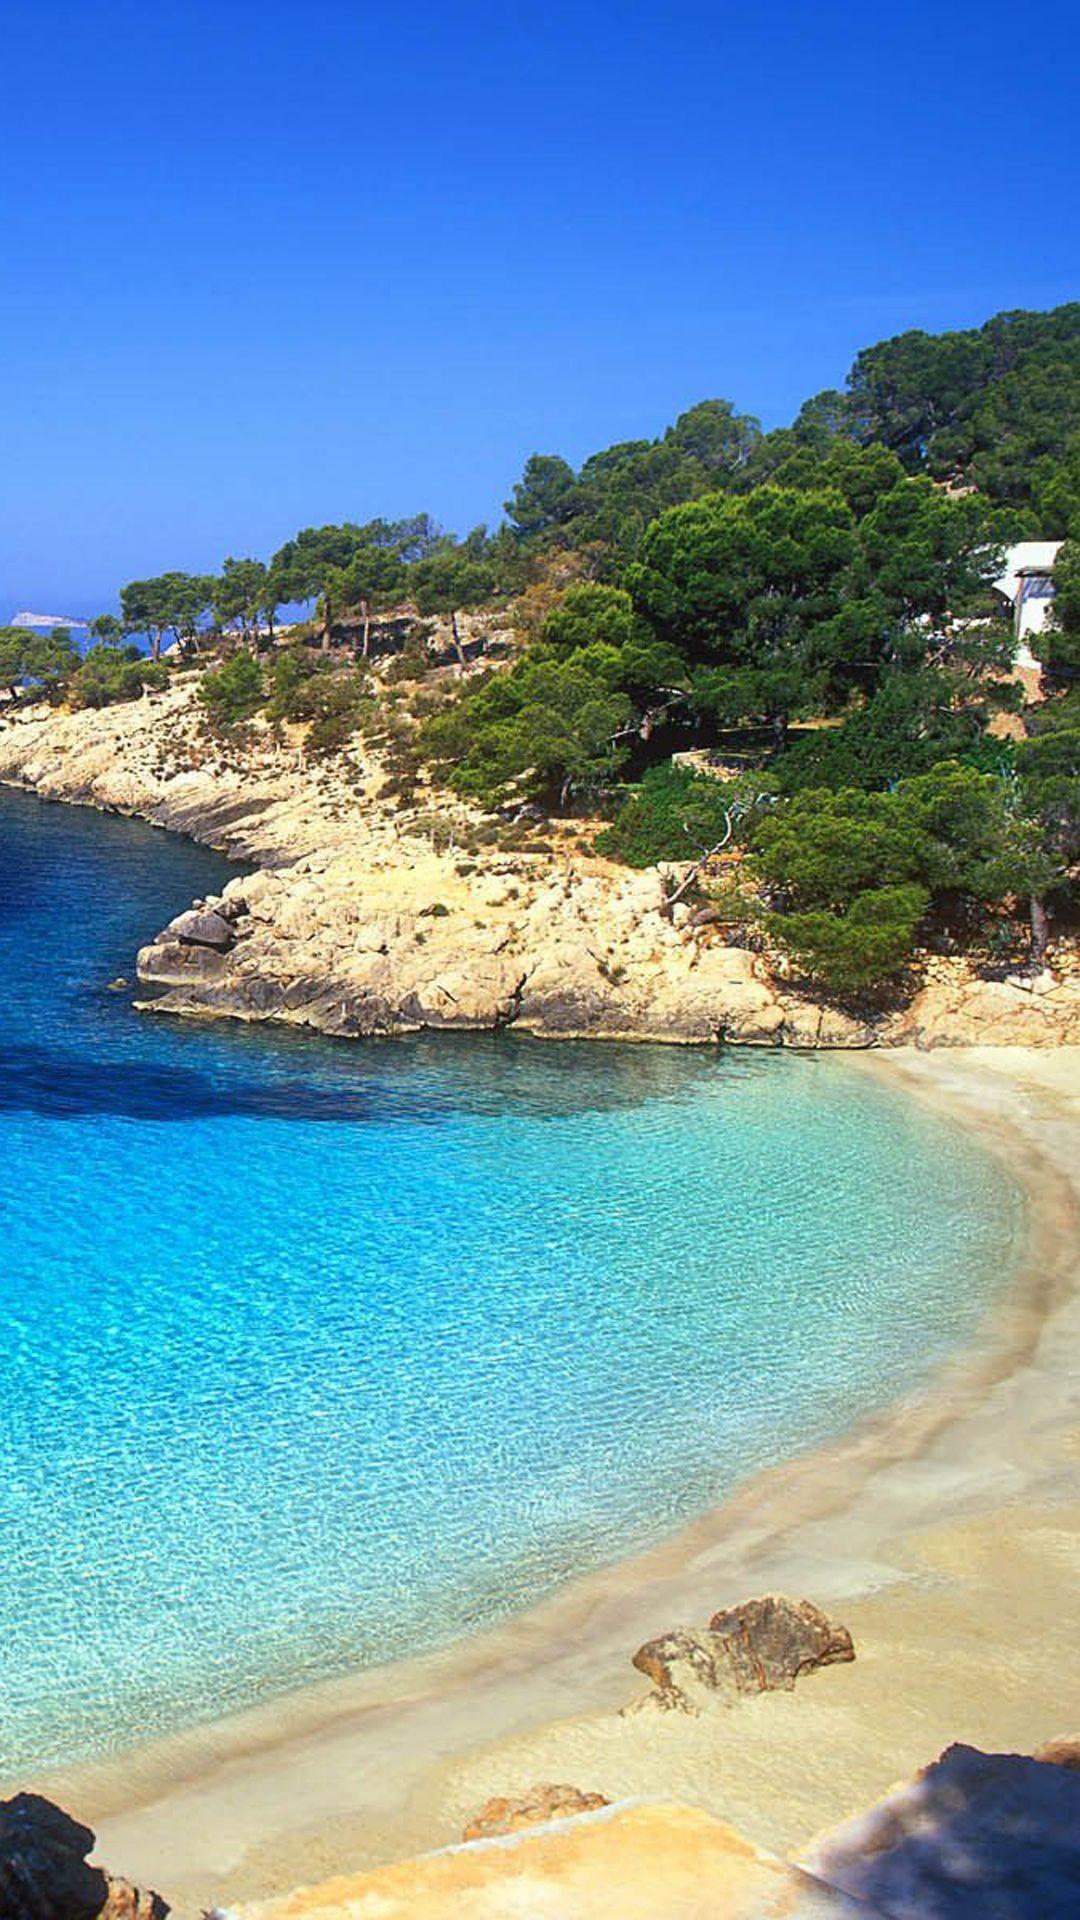 Ibiza Beach Landscape iPhone 6 Plus HD Wallpaper …